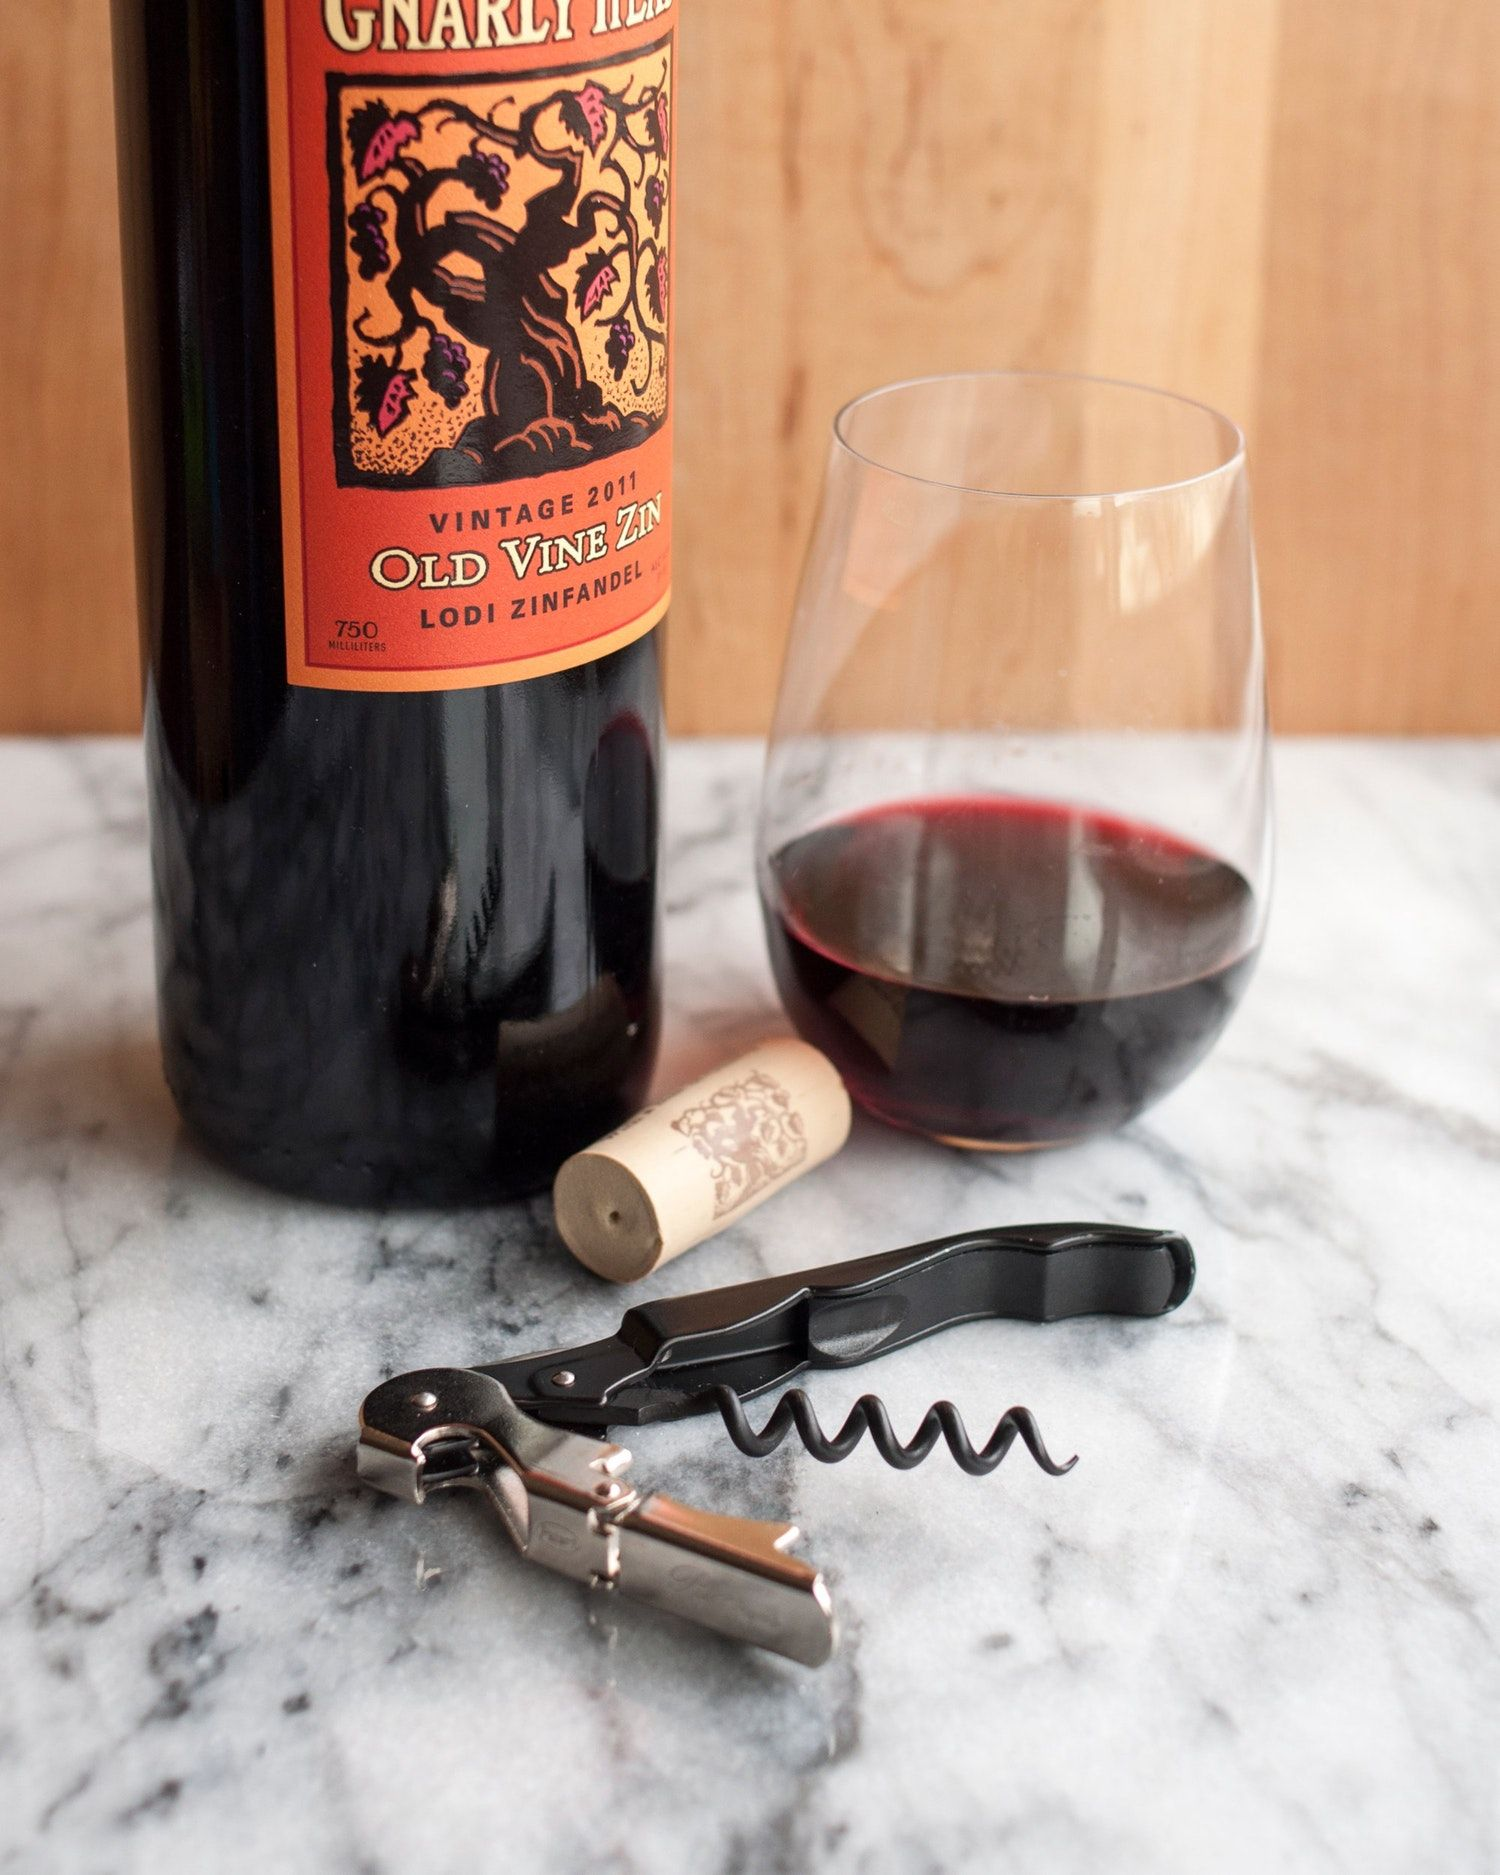 How to open a bottle of wine using a wine key corkscrew